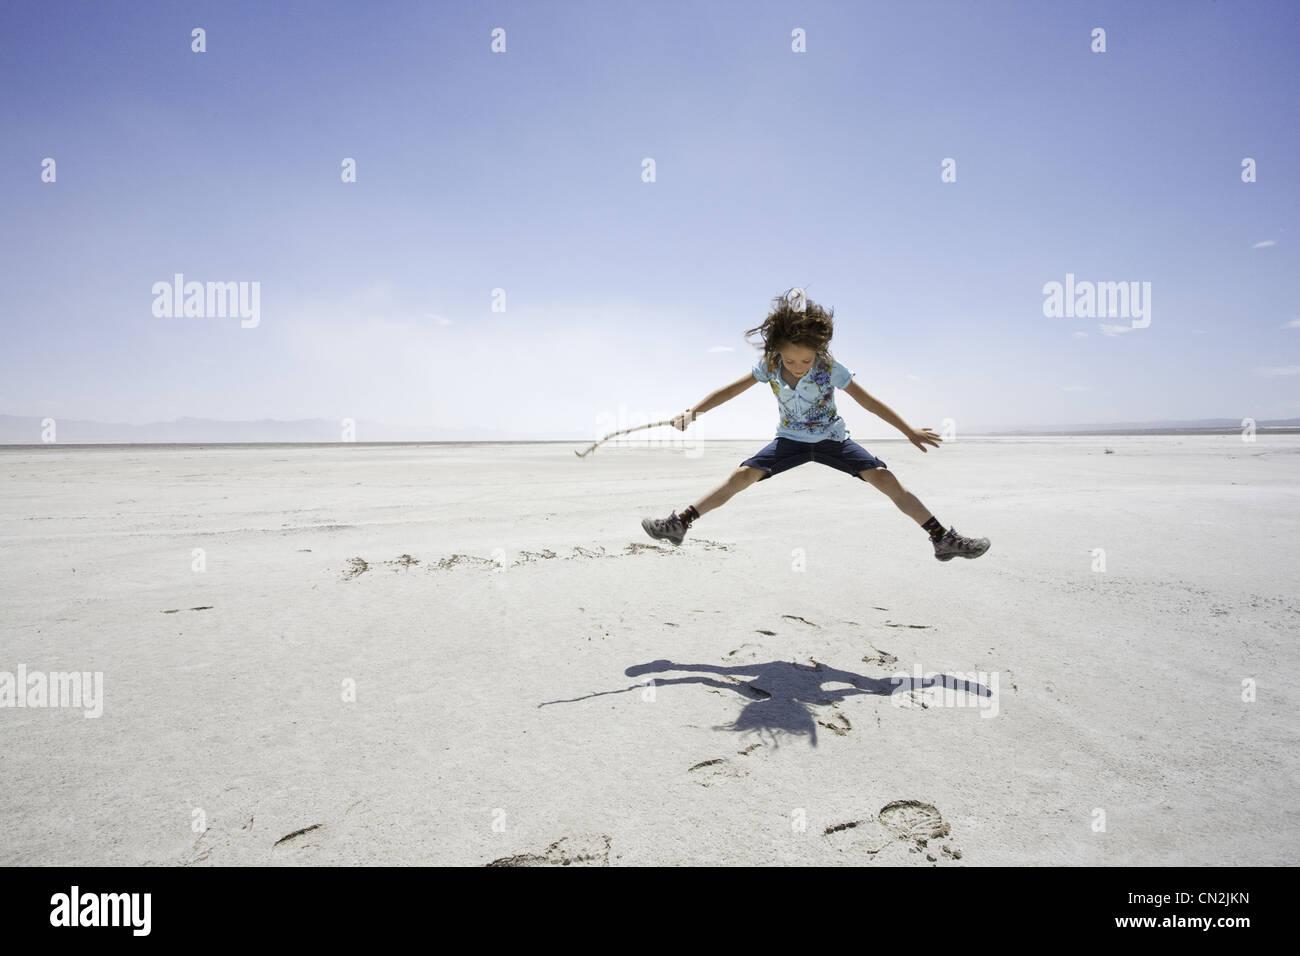 Young Girl Jumping Over Name Scratched into Salt Lake, Utah, USA - Stock Image